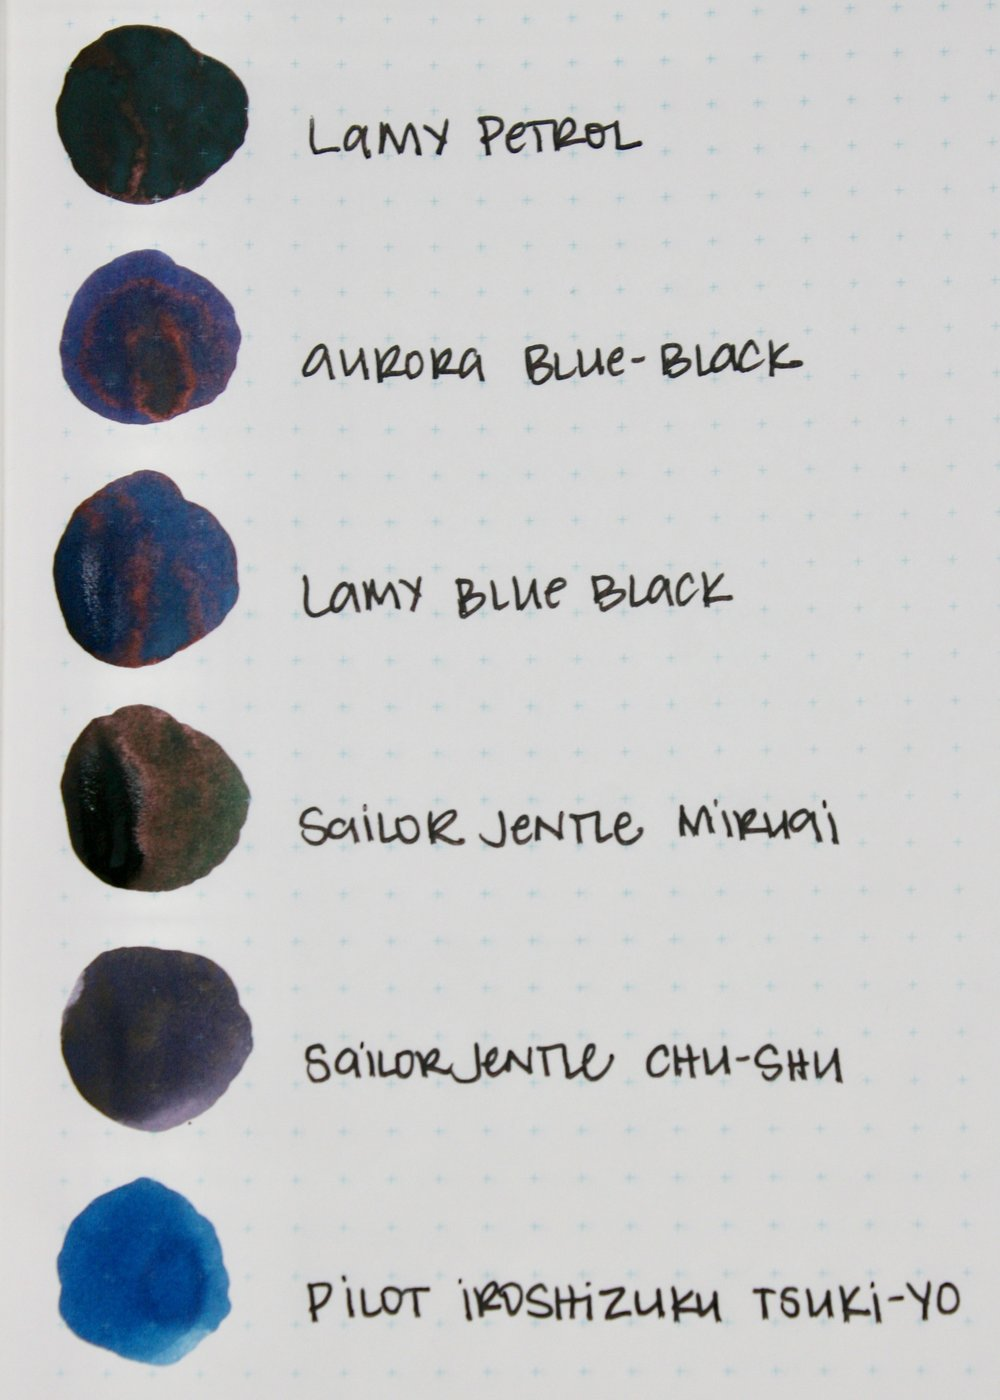 Similar colors: - Aurora Blue-Black looks too blue, as does Lamy Blue Black and Pilot Iroshizuku Tsuki-Yo. Sailor Miruai looks too green and Sailor   Chu-Shu looks too grey.